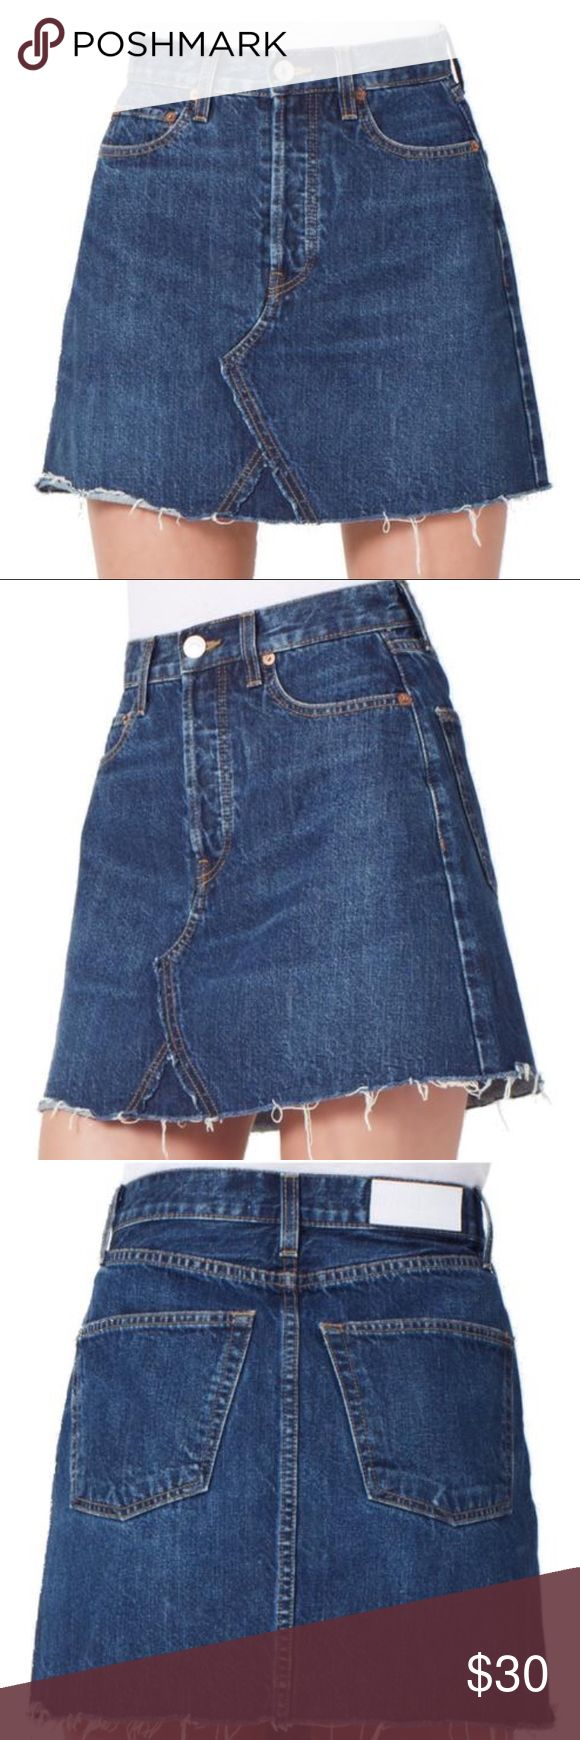 HSKM DISTRESSED JEAN SKIRT!!! Beautiful distressed jean skirt from REDONE!! Size small!! Free People Skirts Mini